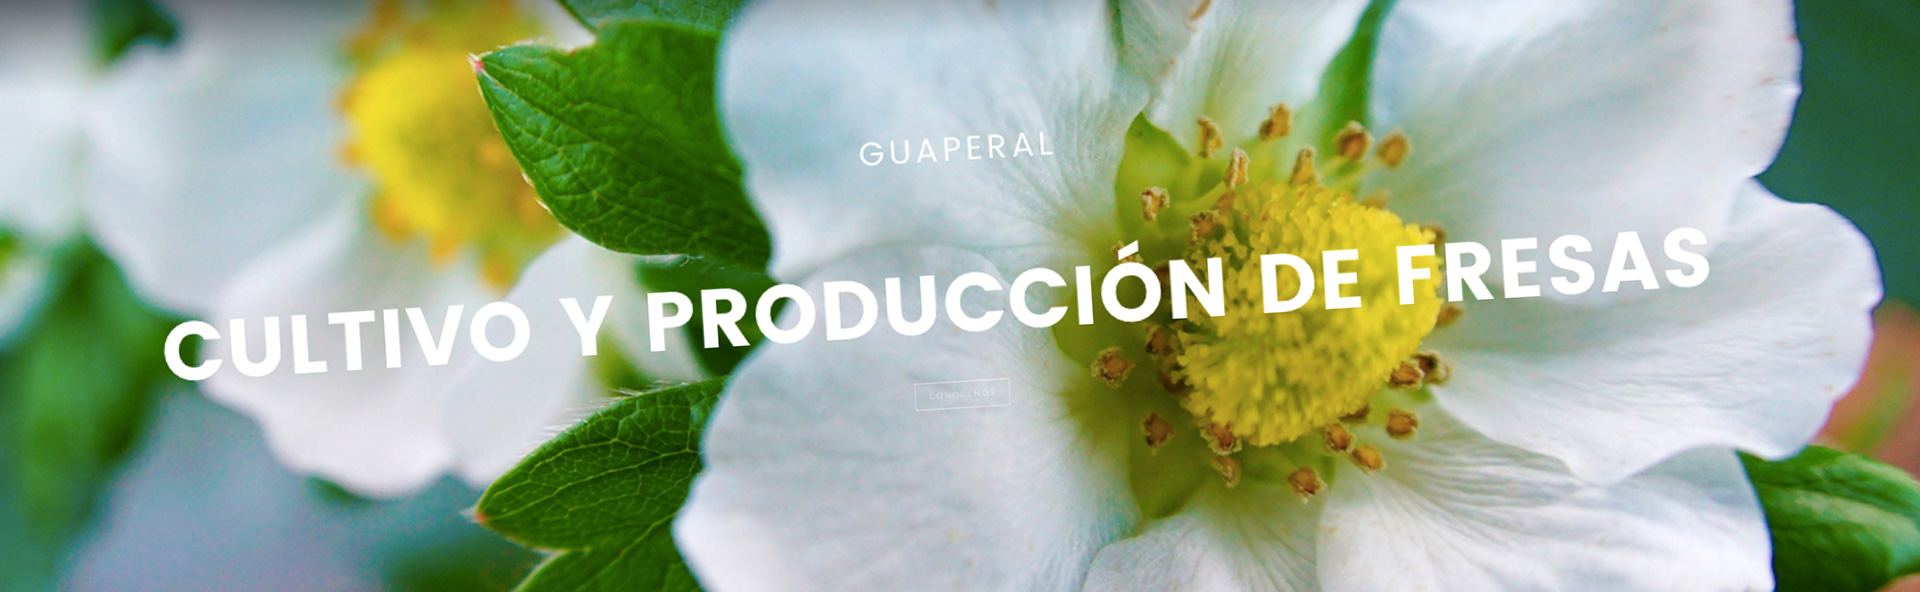 Fresas de calidad en Huelva